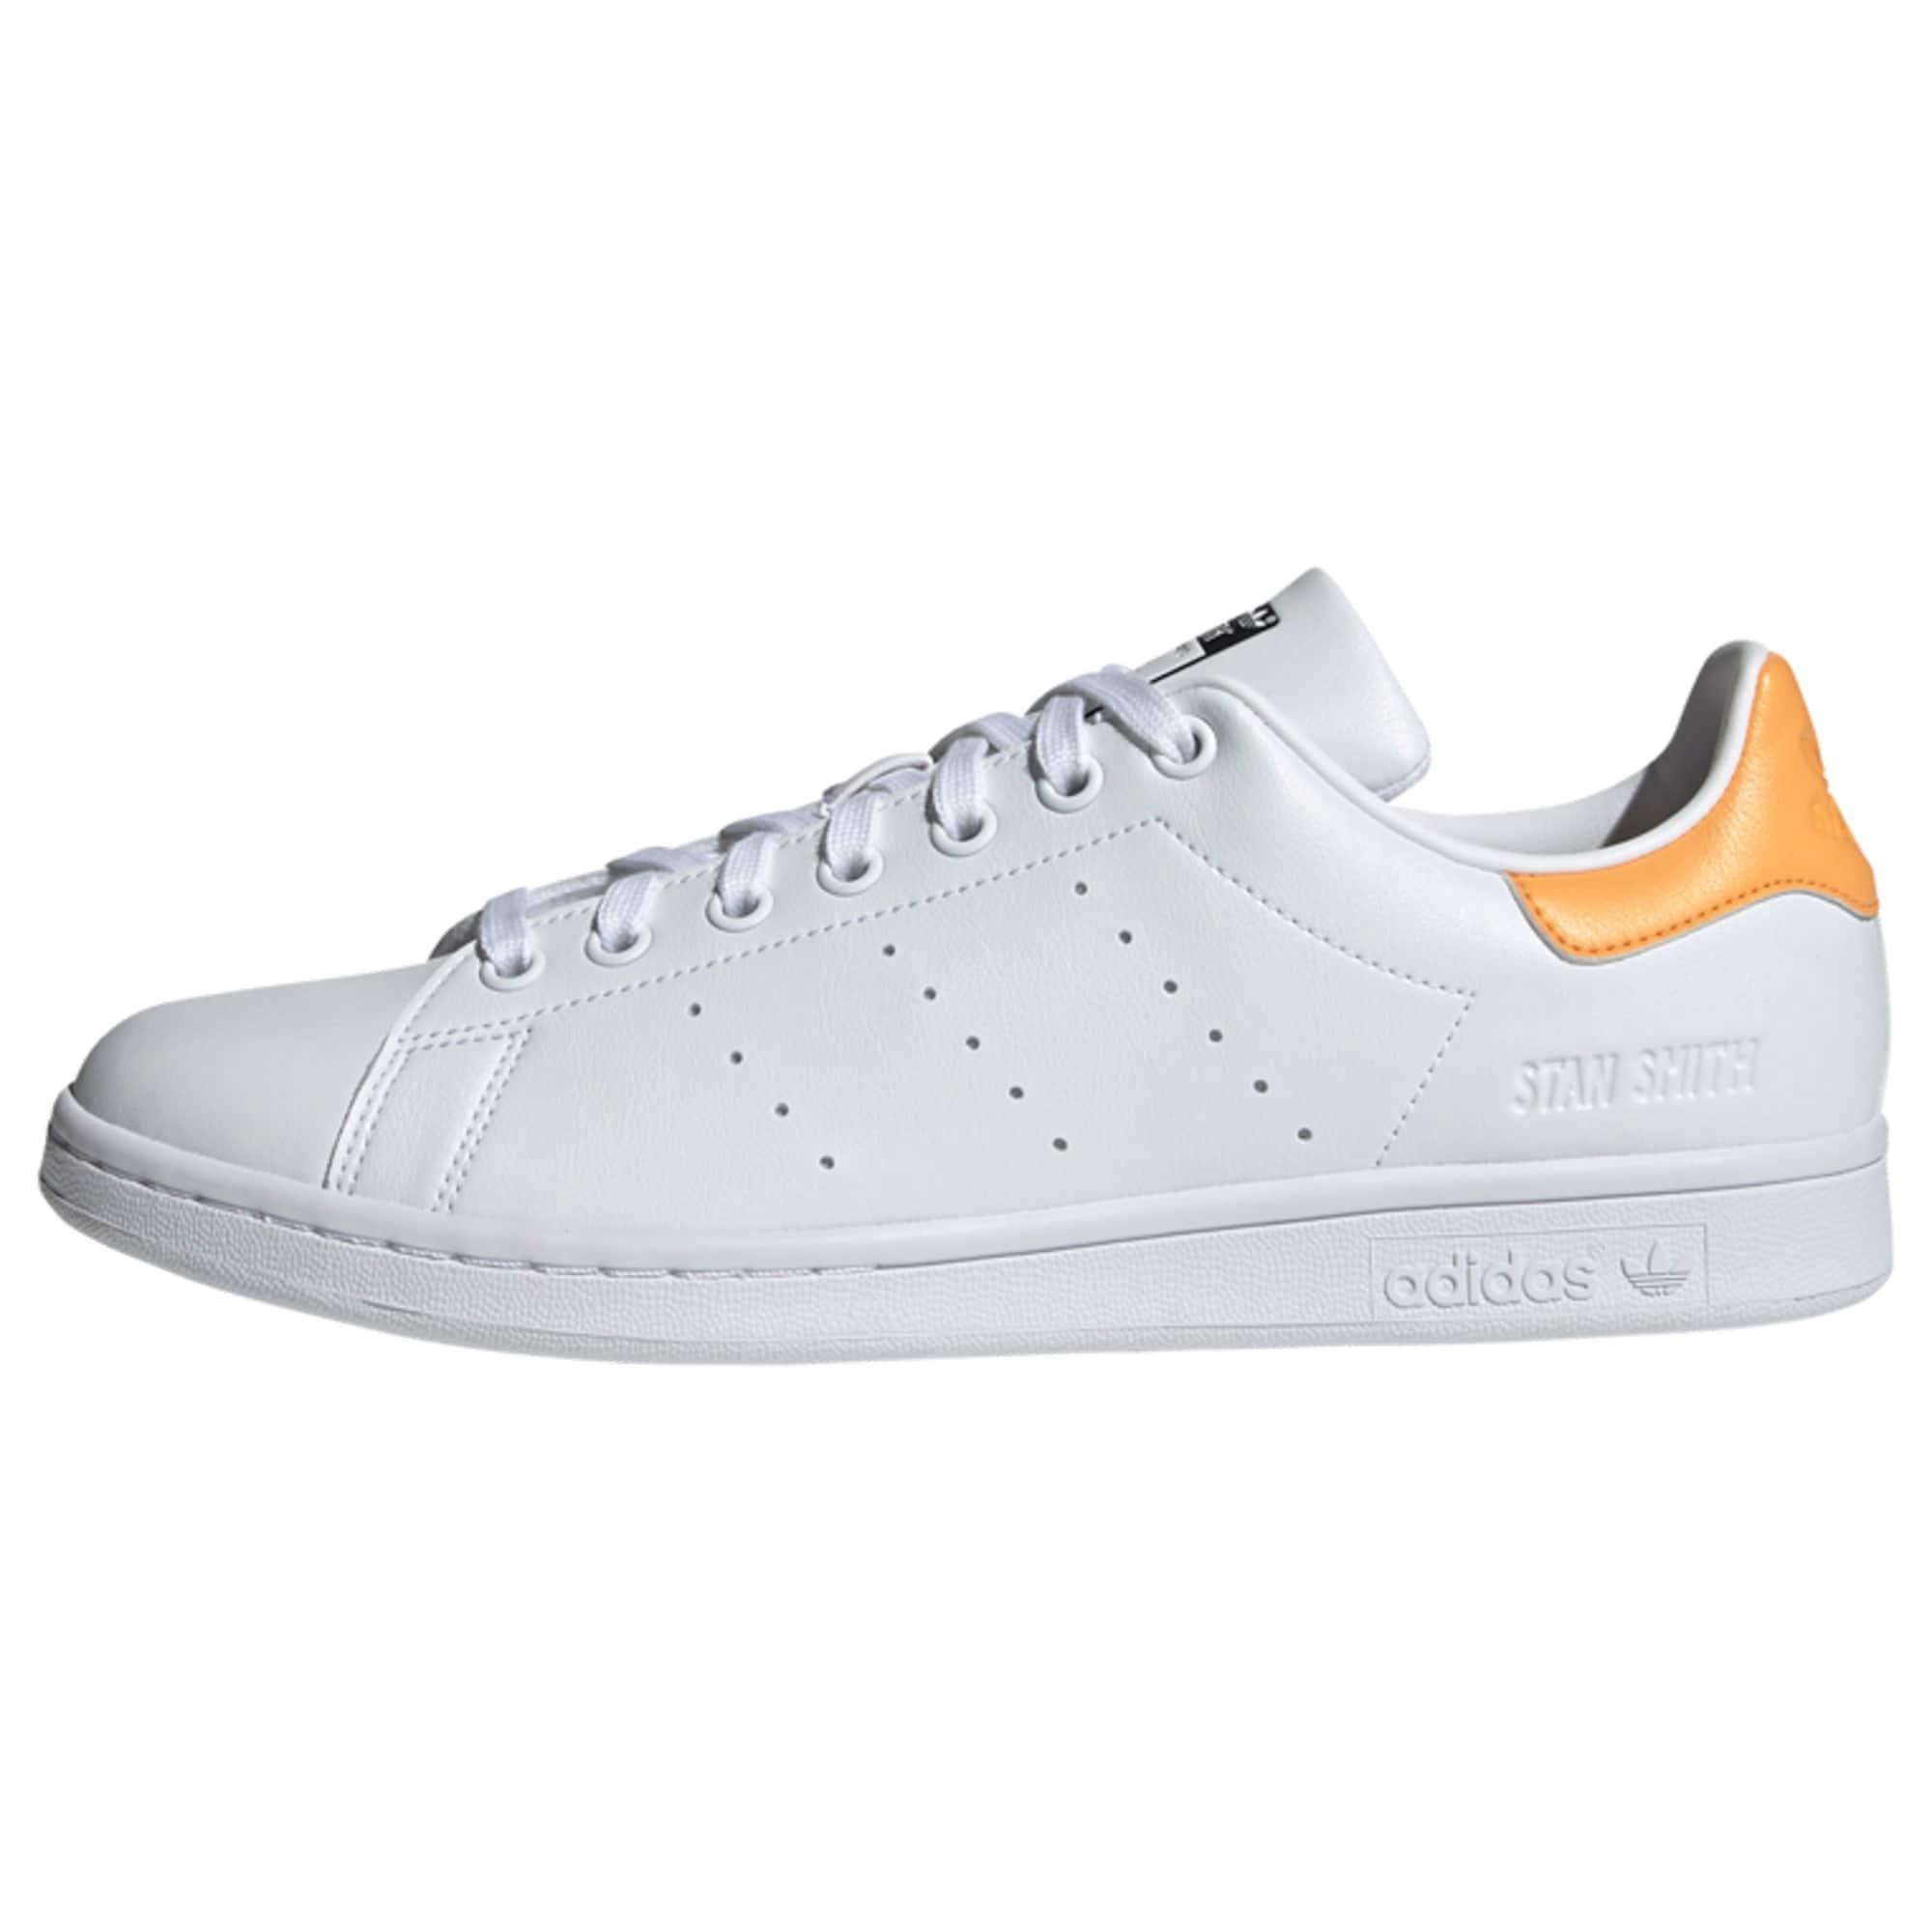 ADIDAS ORIGINALS Tenisky ' Stan Smith'  bílá / oranžová